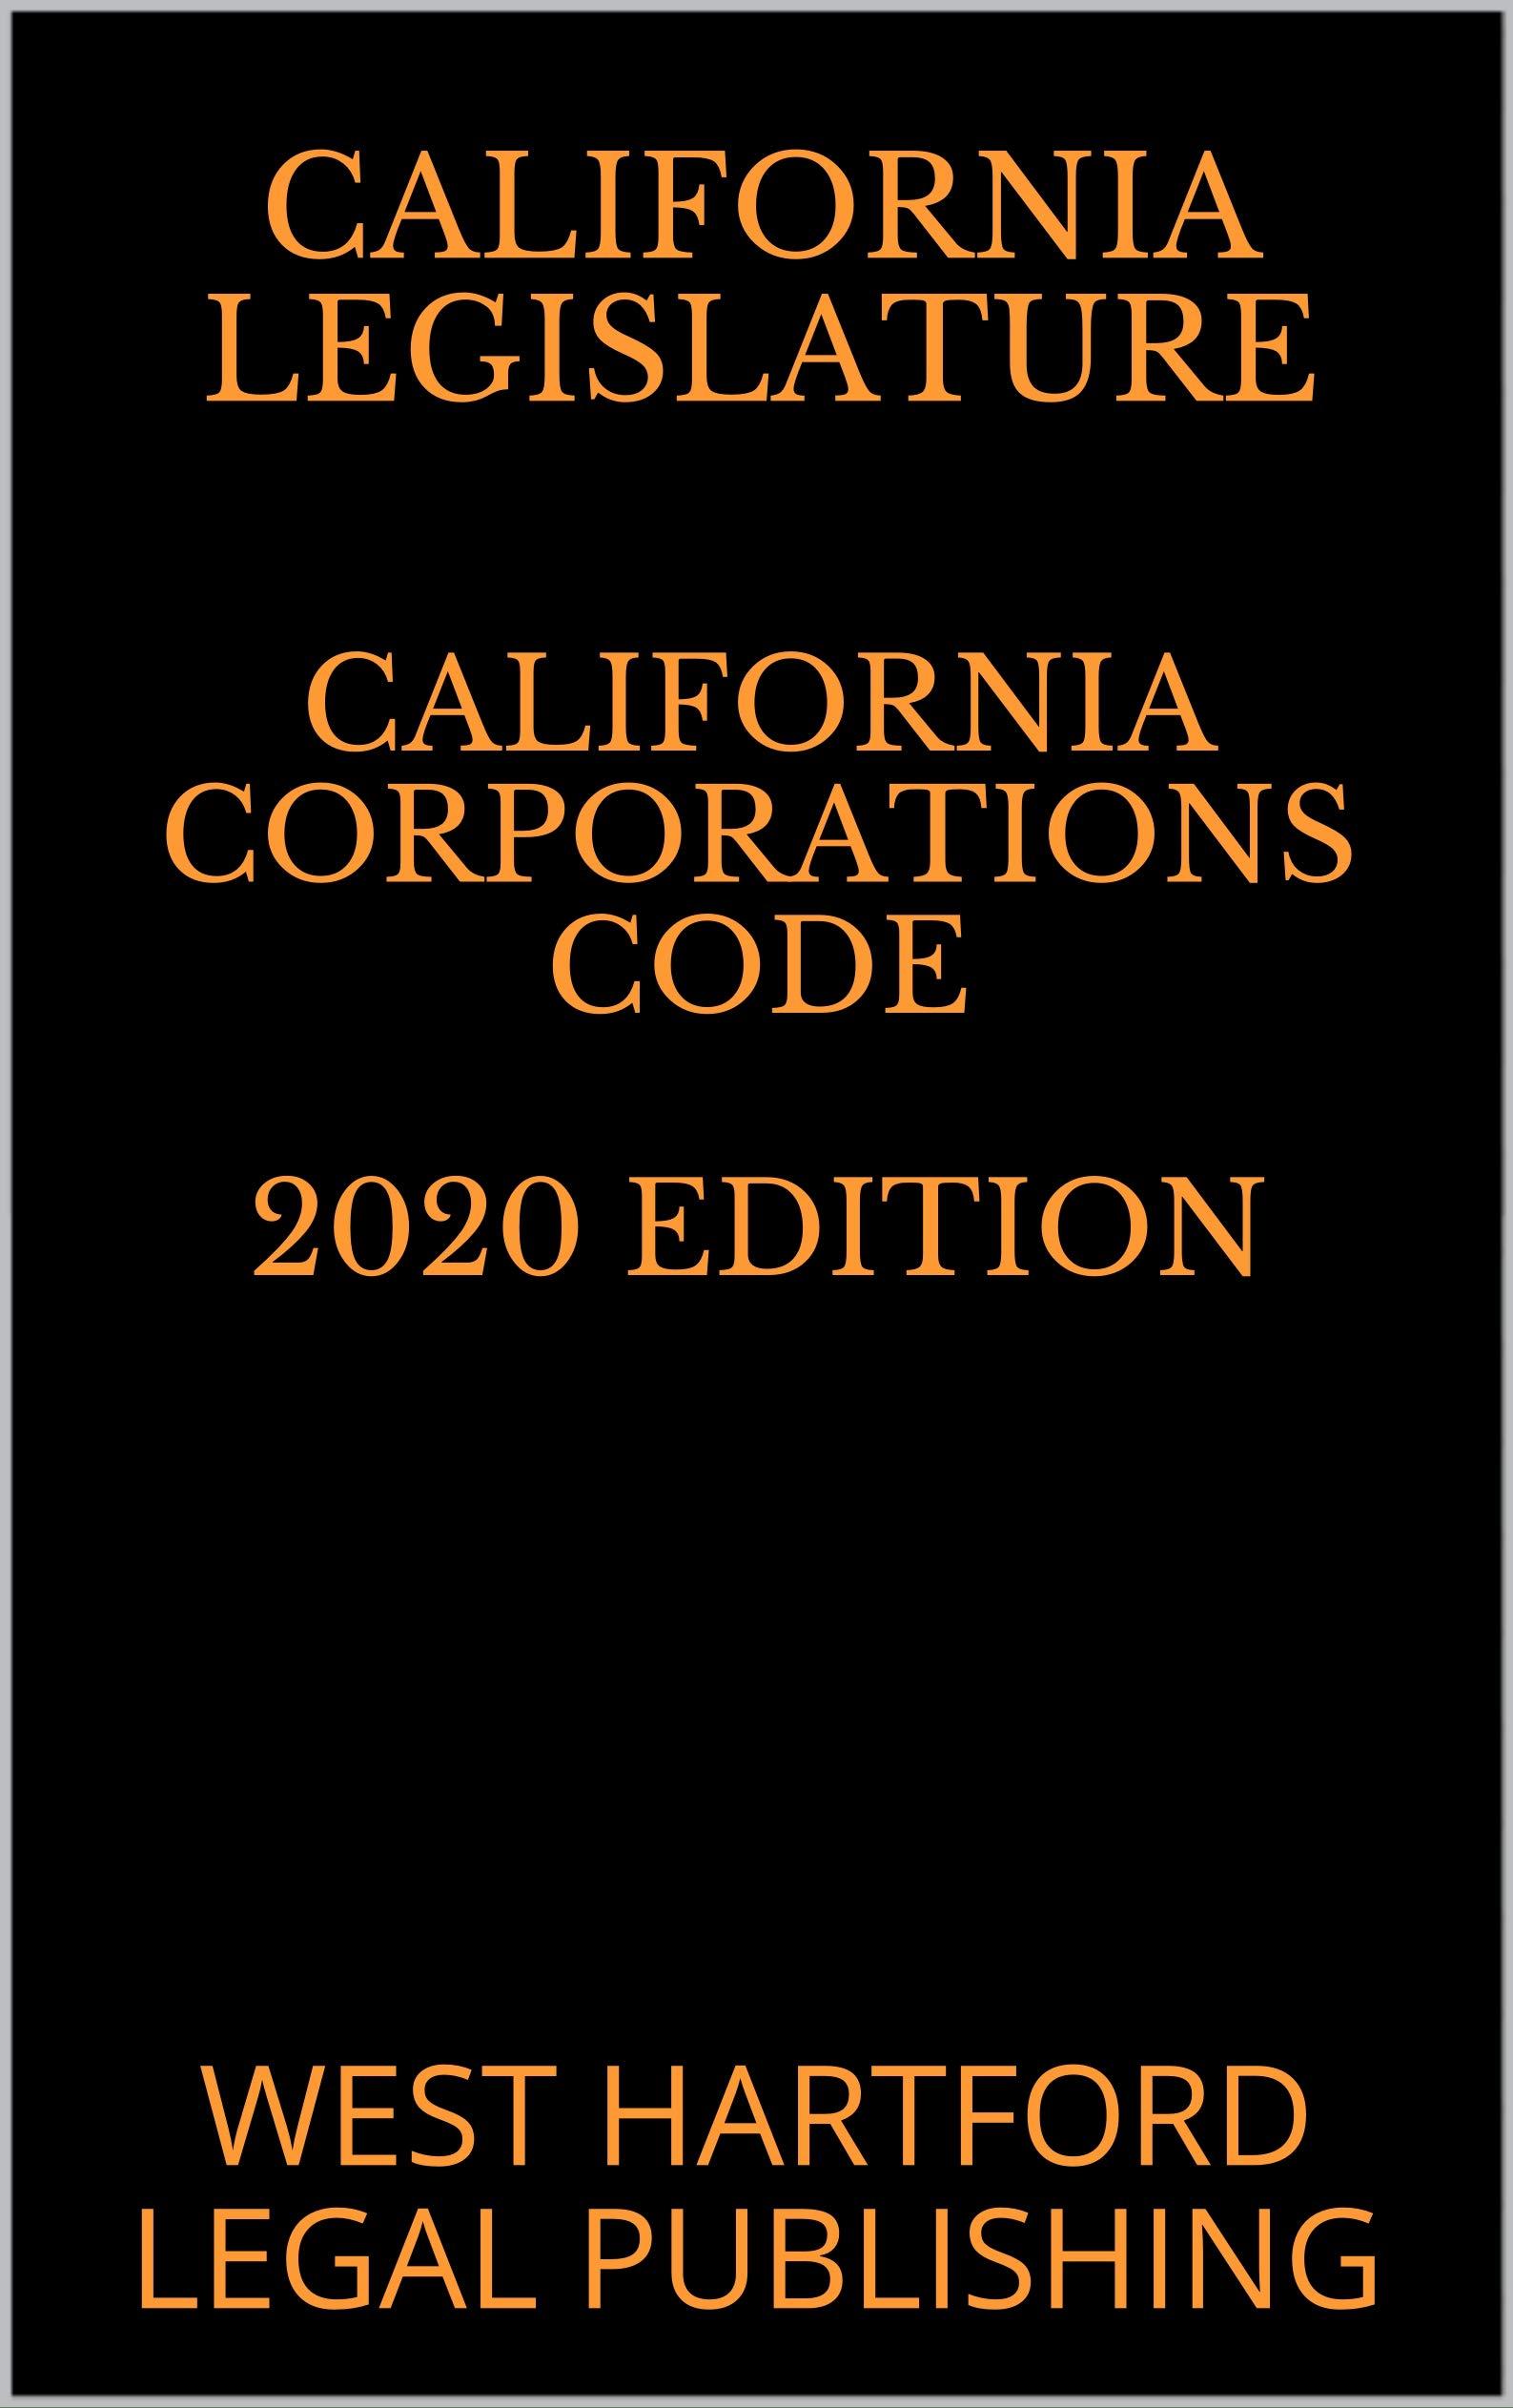 CALIFORNIA CORPORATIONS CODE 2020 EDITION: WEST HARTFORD LEGAL PUBLISHING